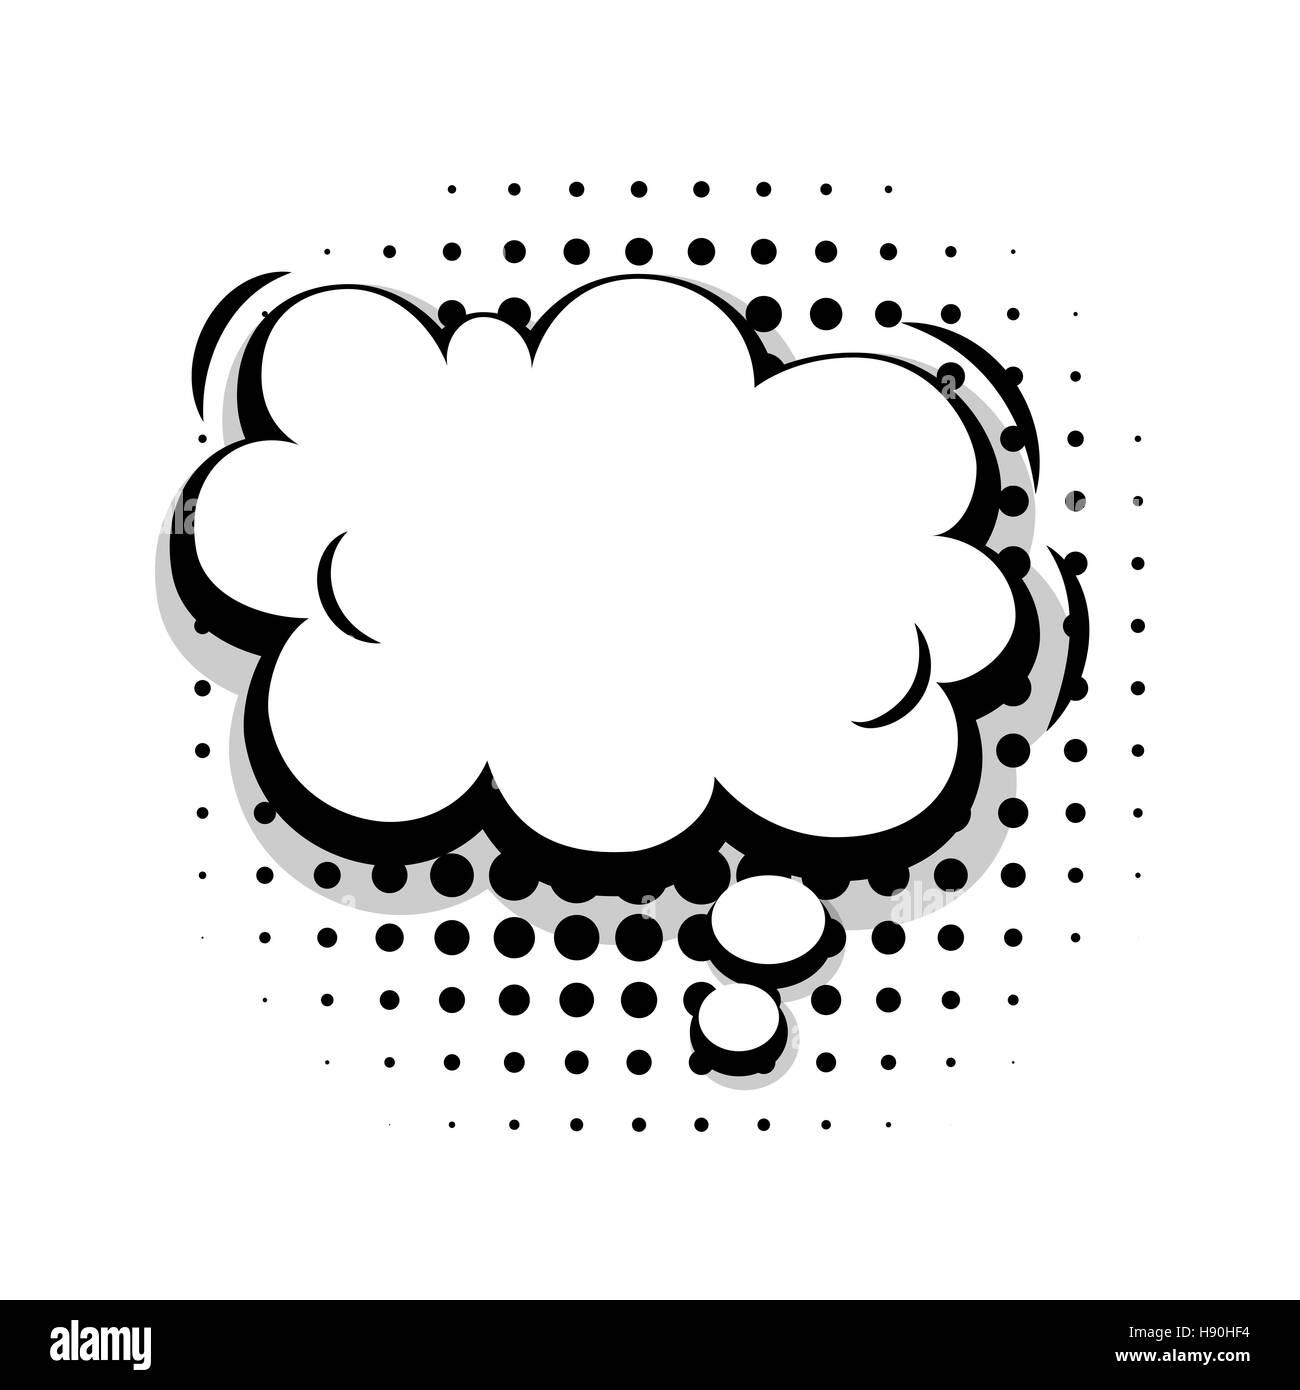 Tim Green - Halftone / Midnight Roller